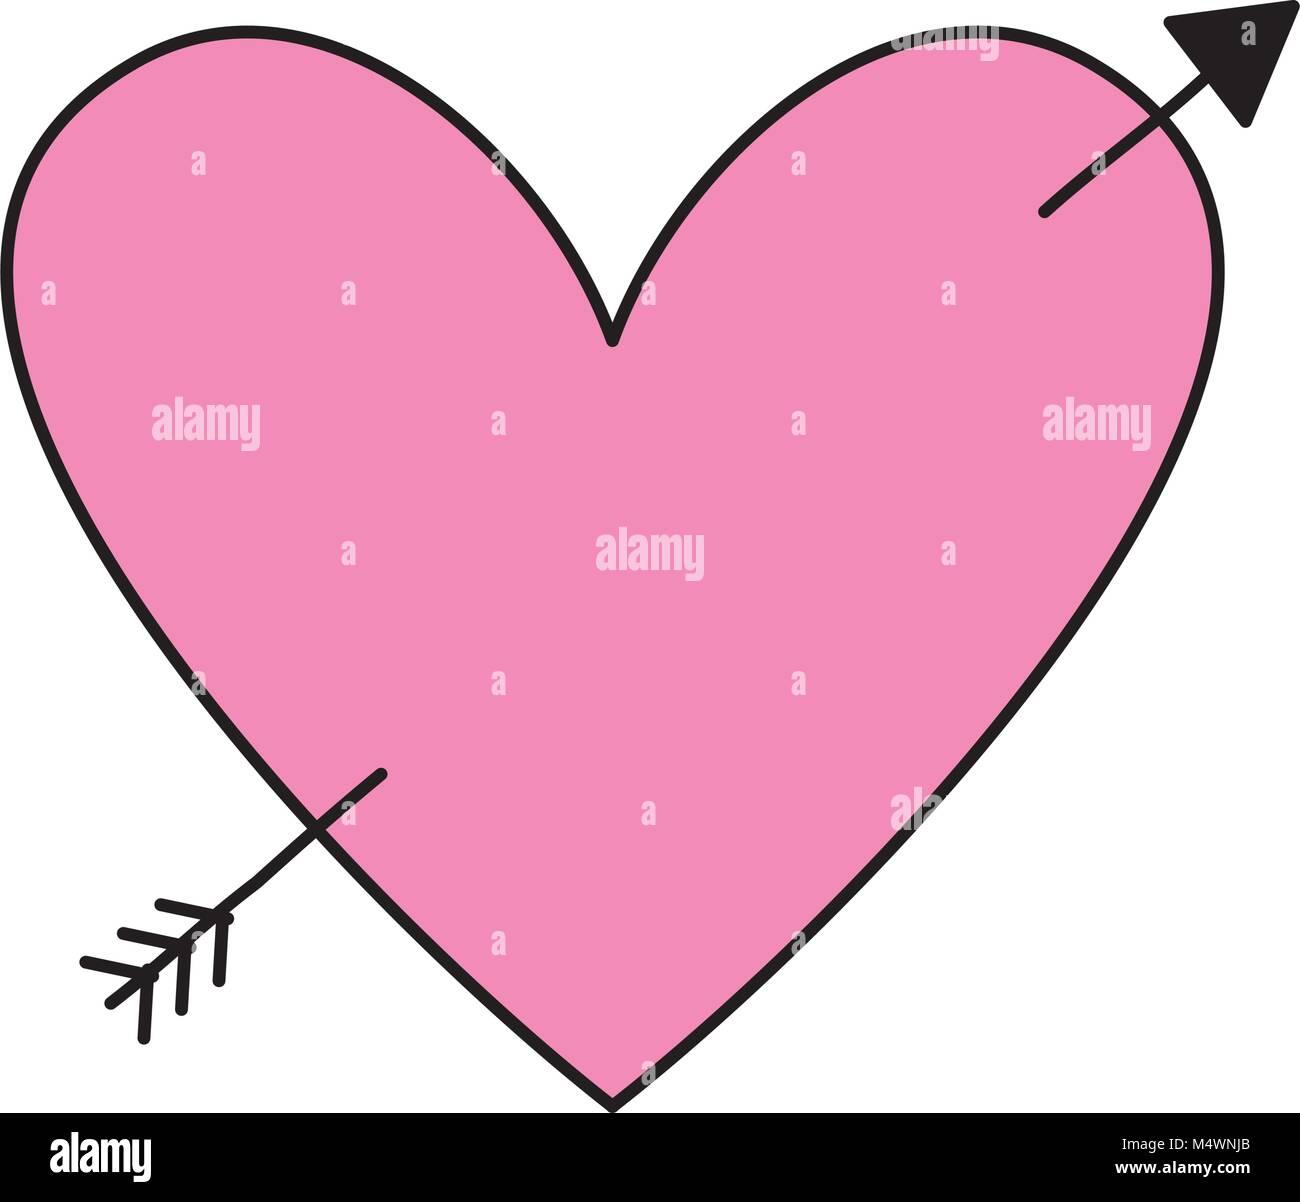 Love Heart Pierced Arrow Valentine Day Romantic Stock Vector Art